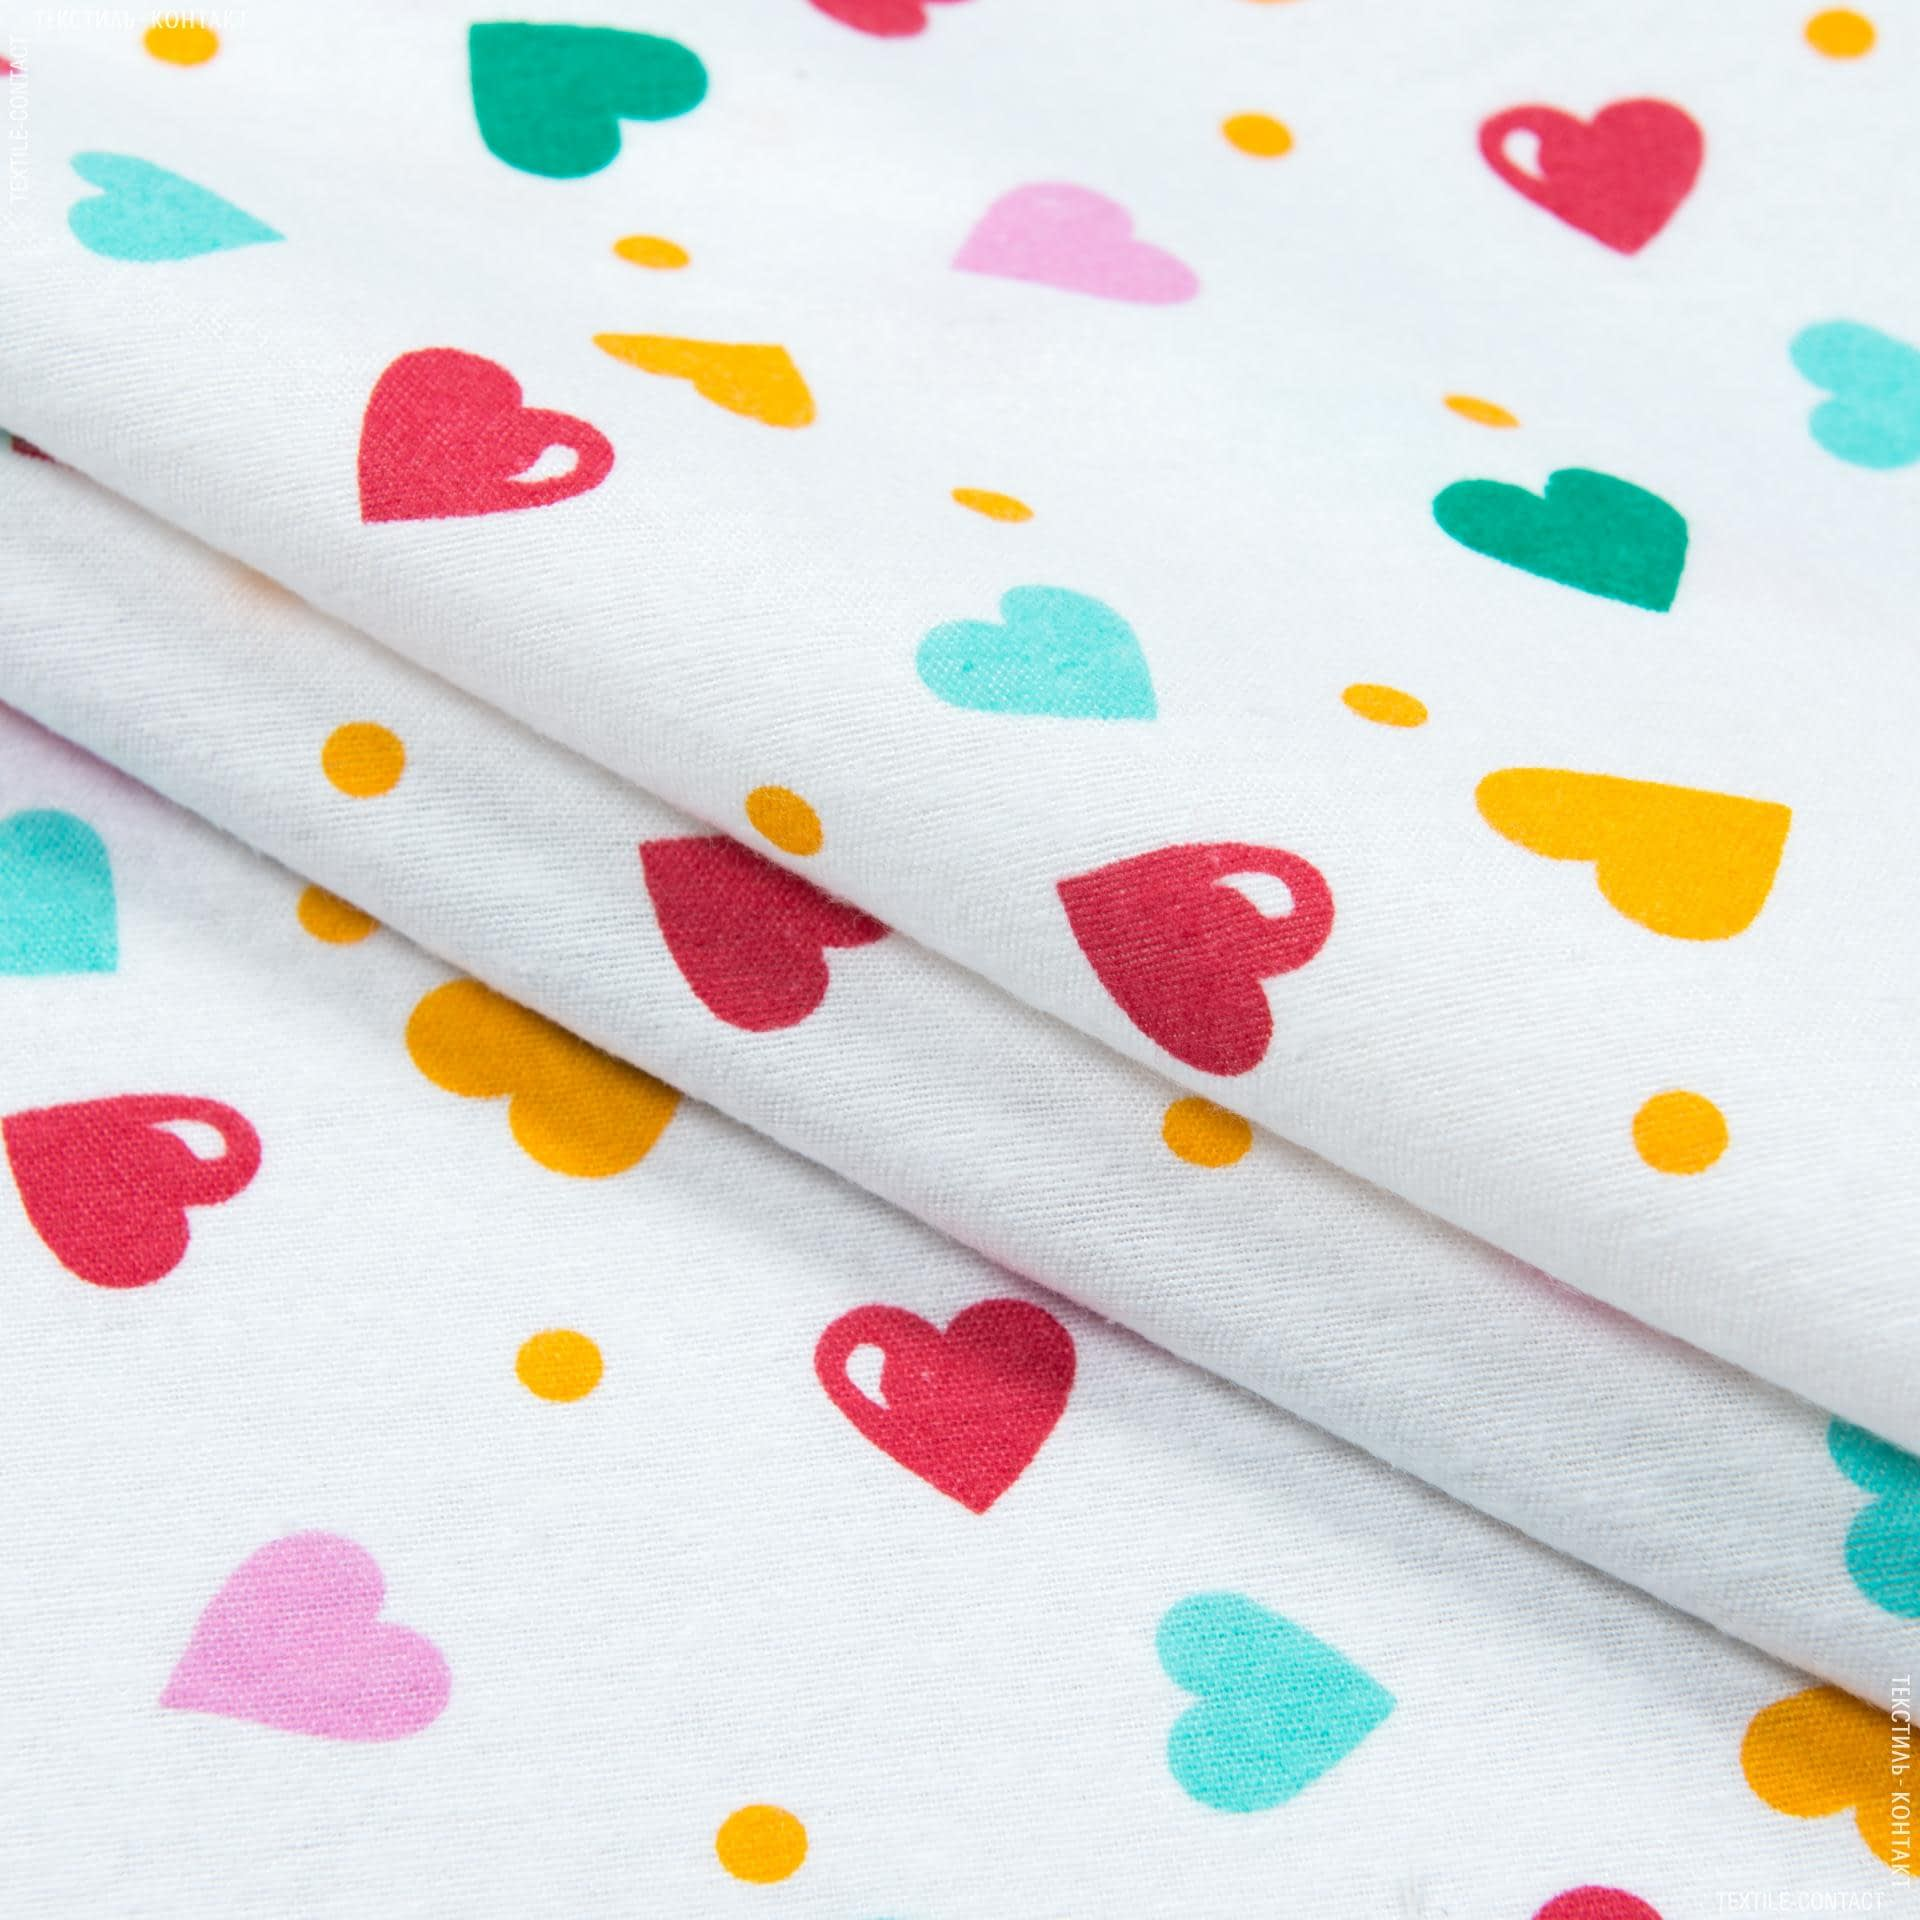 Тканини для дитячого одягу - Фланель білоземельна дитяча